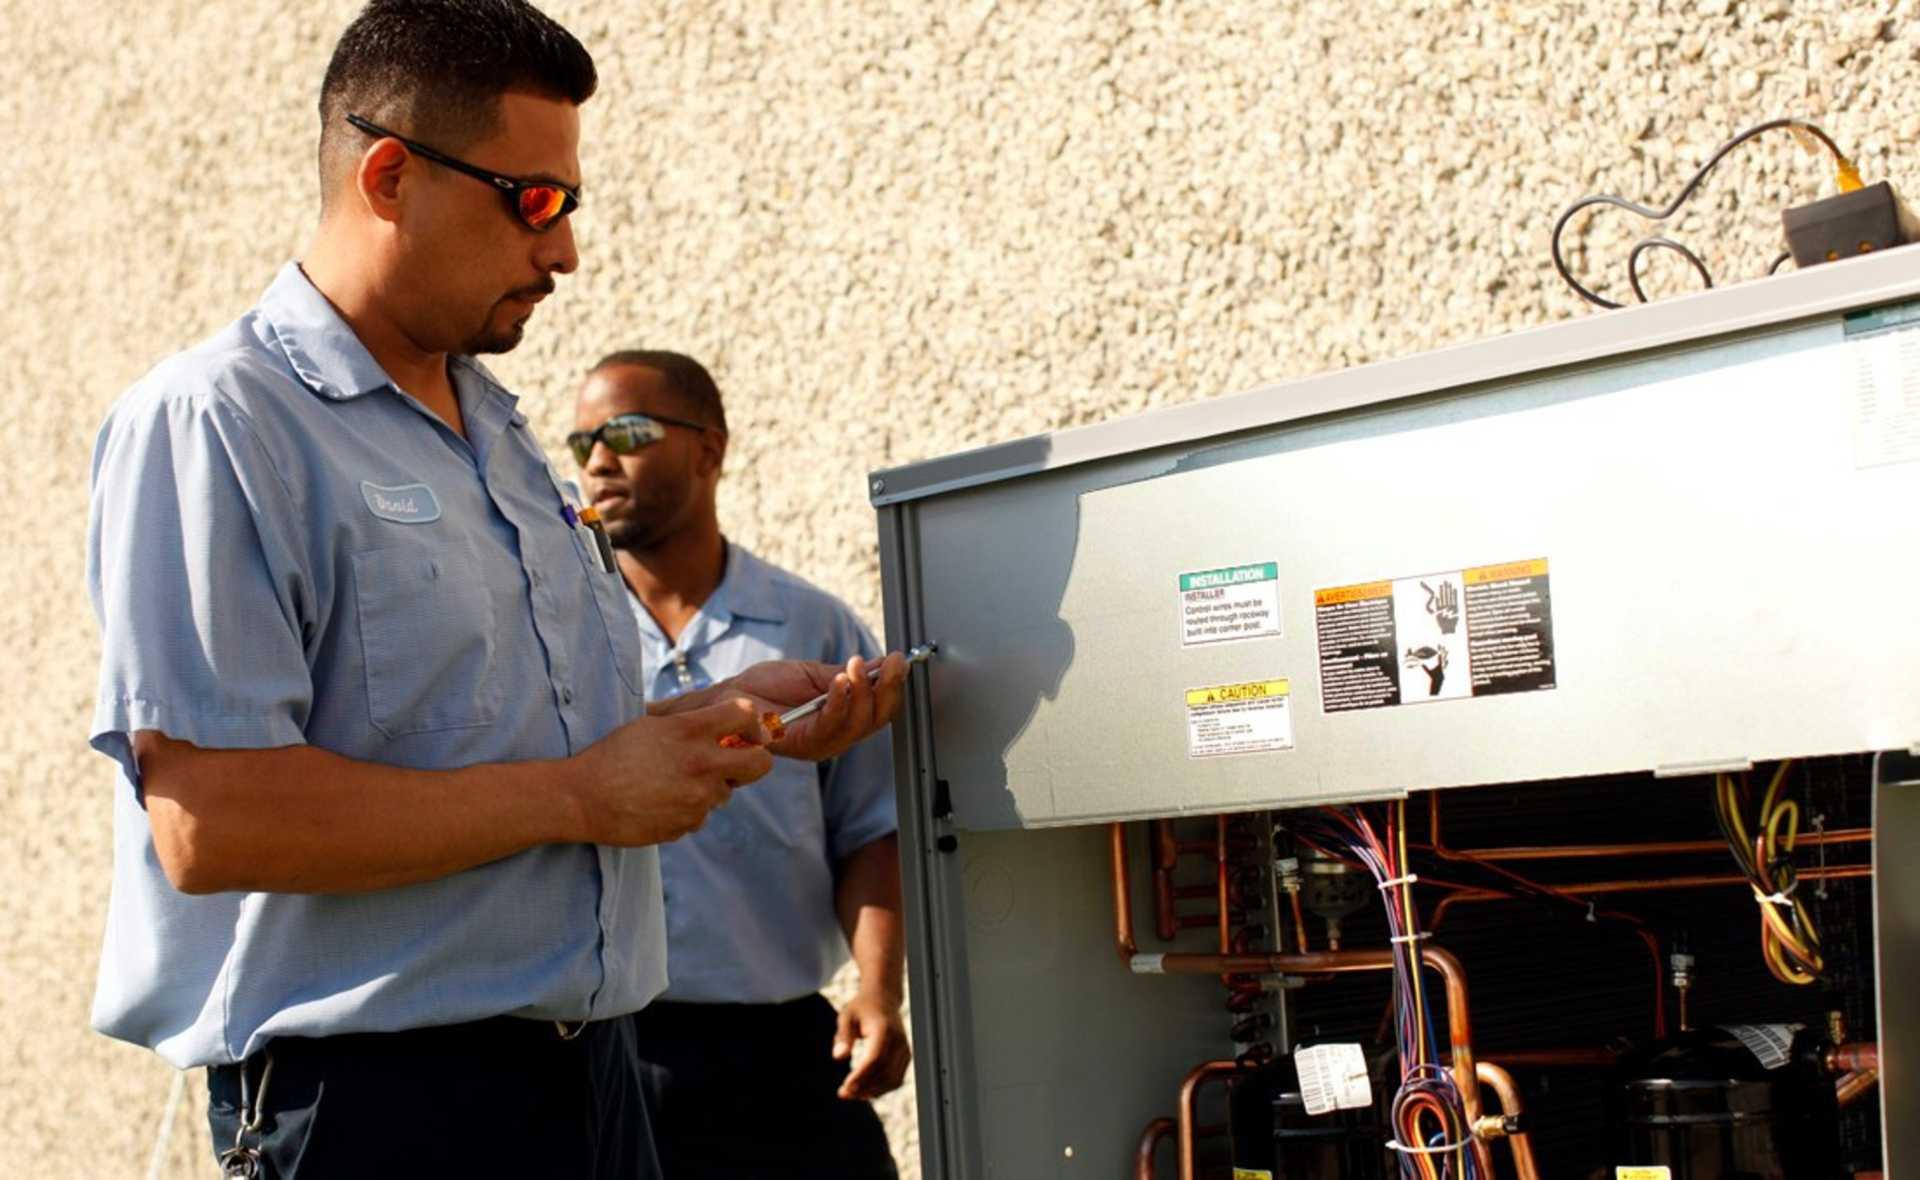 Two HVAC technicians repairing AC unit